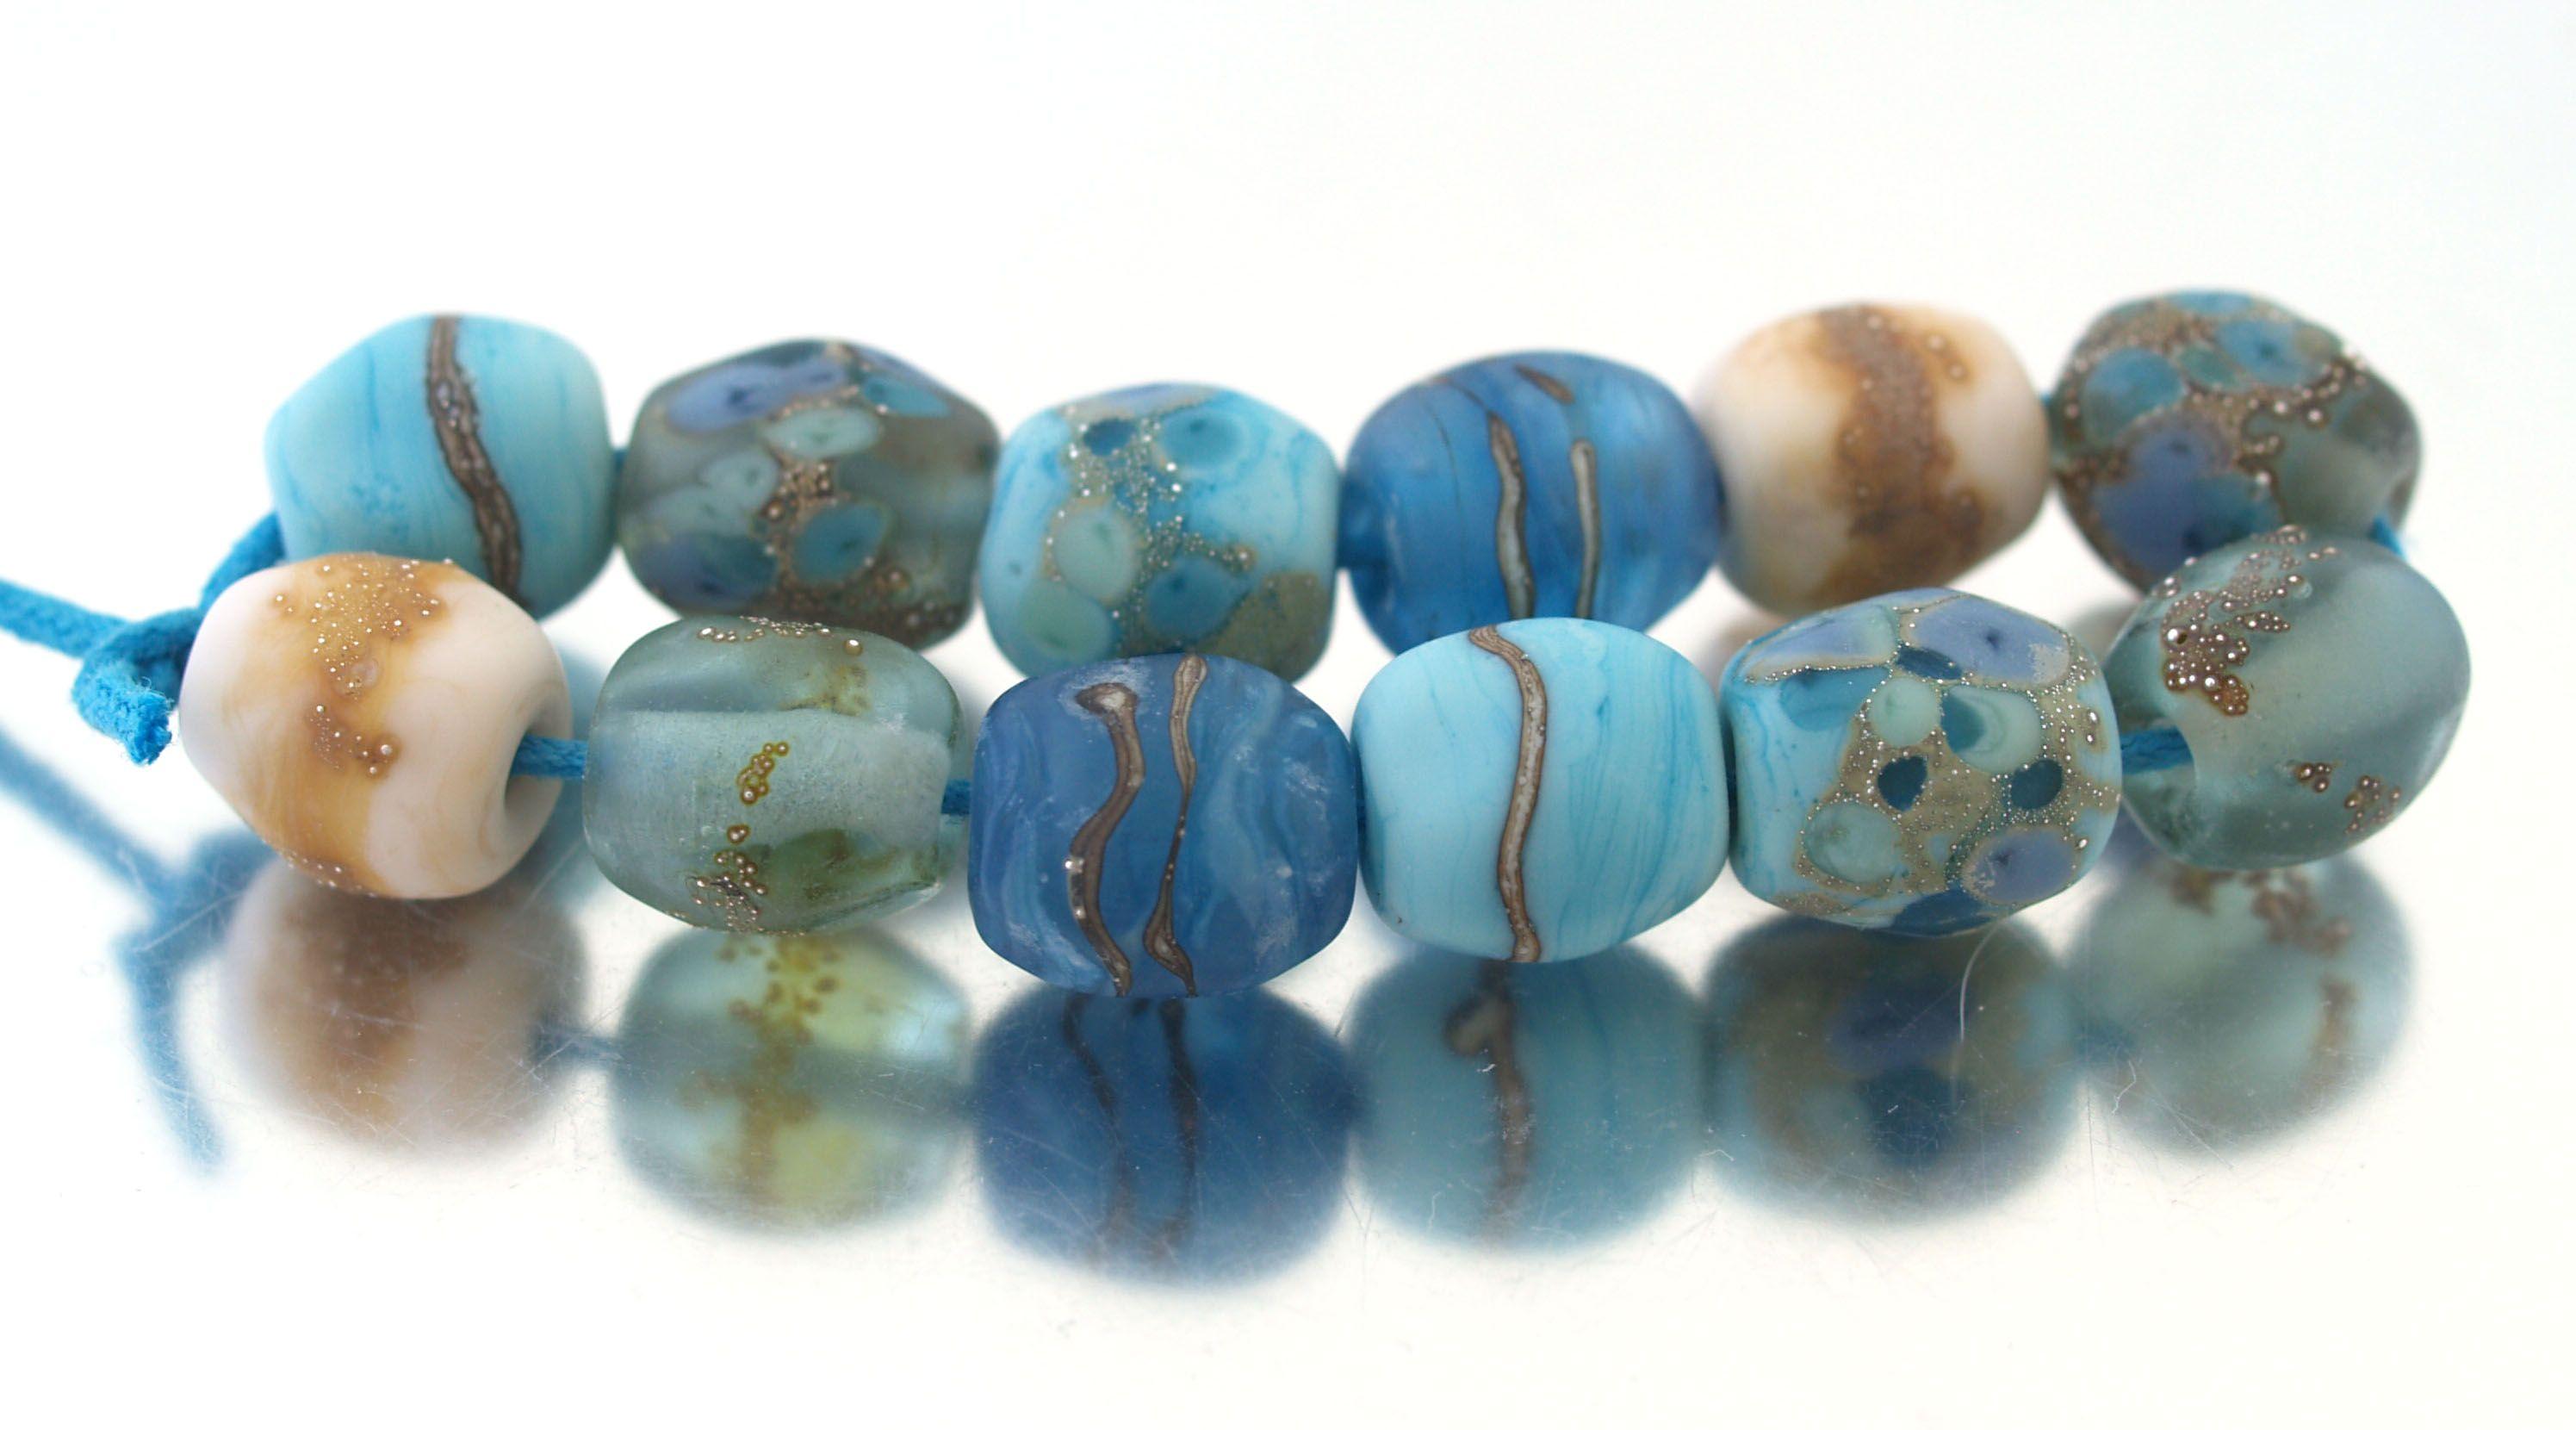 Organic style nugget shaped beads